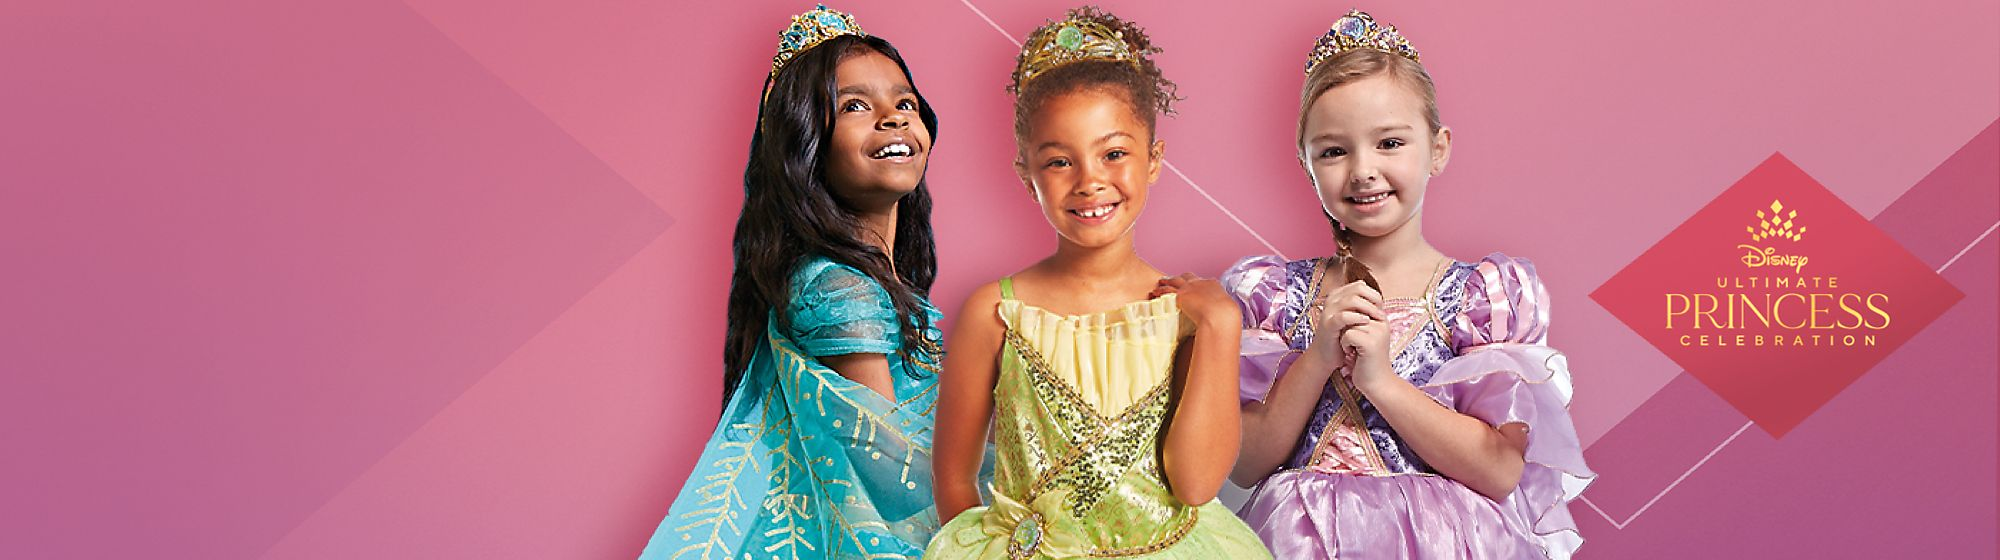 Disney Princess for Kids Explore our enchanting range of Disney Princess dolls, toys and costumes